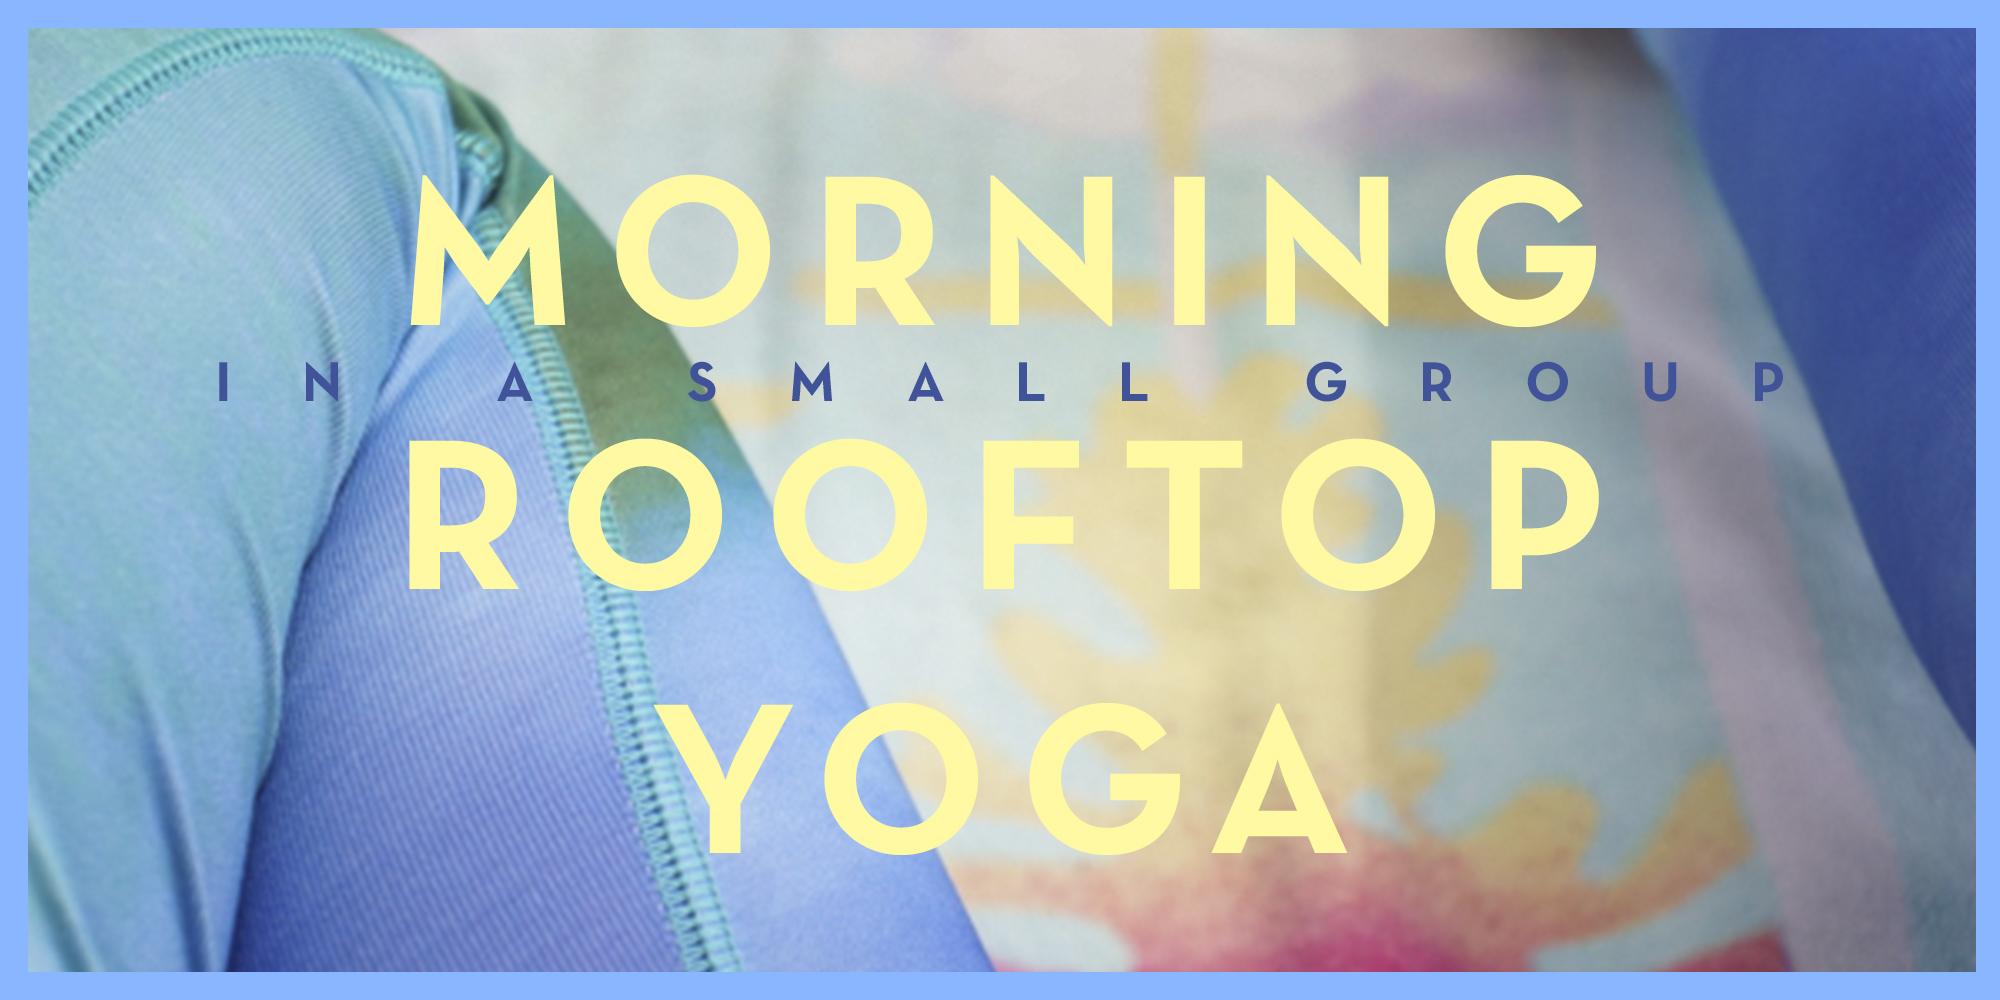 Morning-Rooftop-Yoga-Berlin.jpg